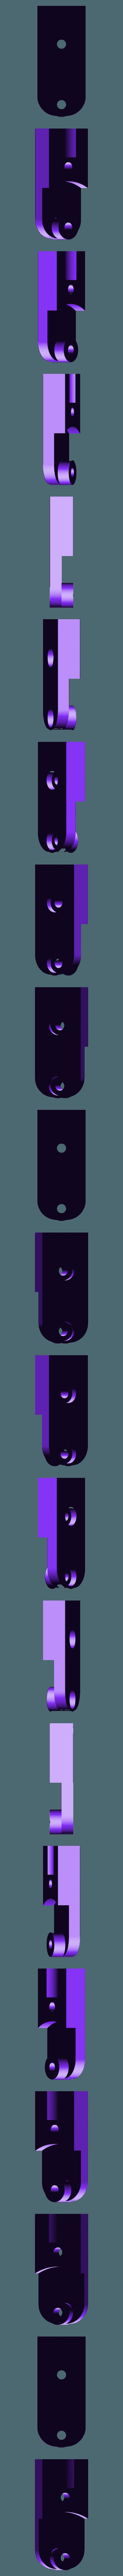 Geared_Extrude_filament_pressure_bar_partA.stl Download free STL file FDM Printer de Kleine Reus 300x300x900 • 3D printable object, Job